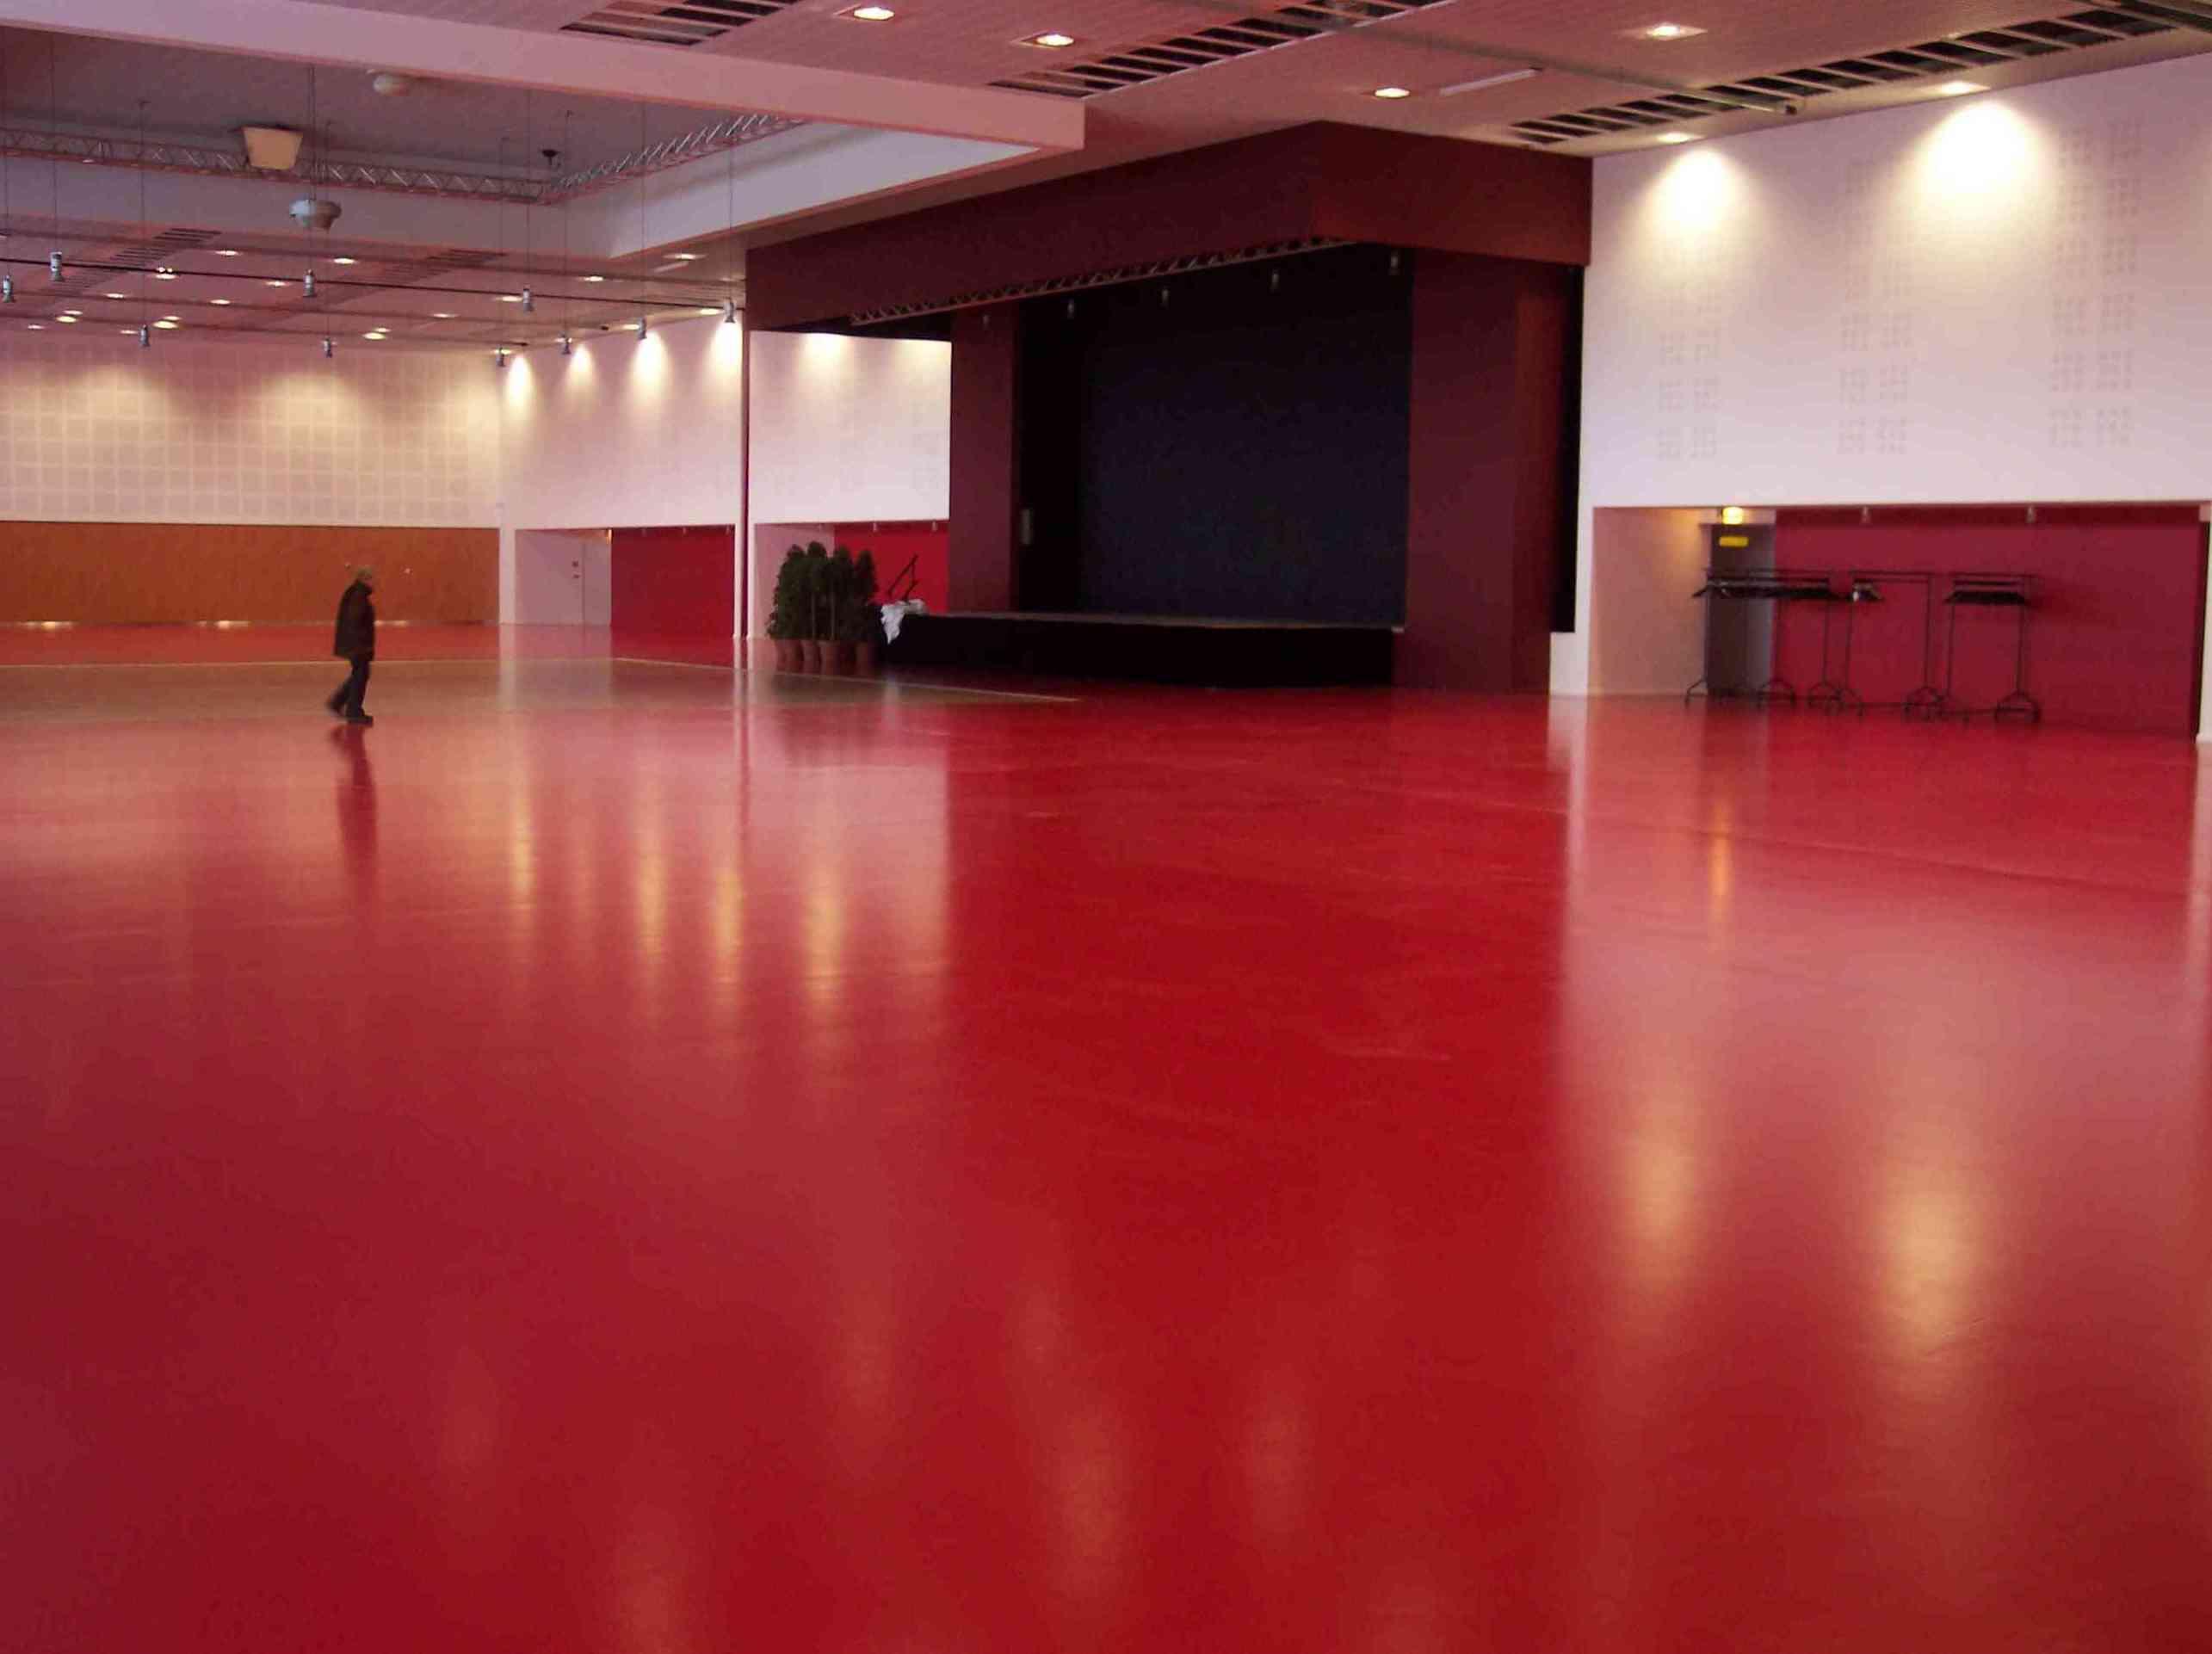 Pavimento epoxi en sala de exposiciones